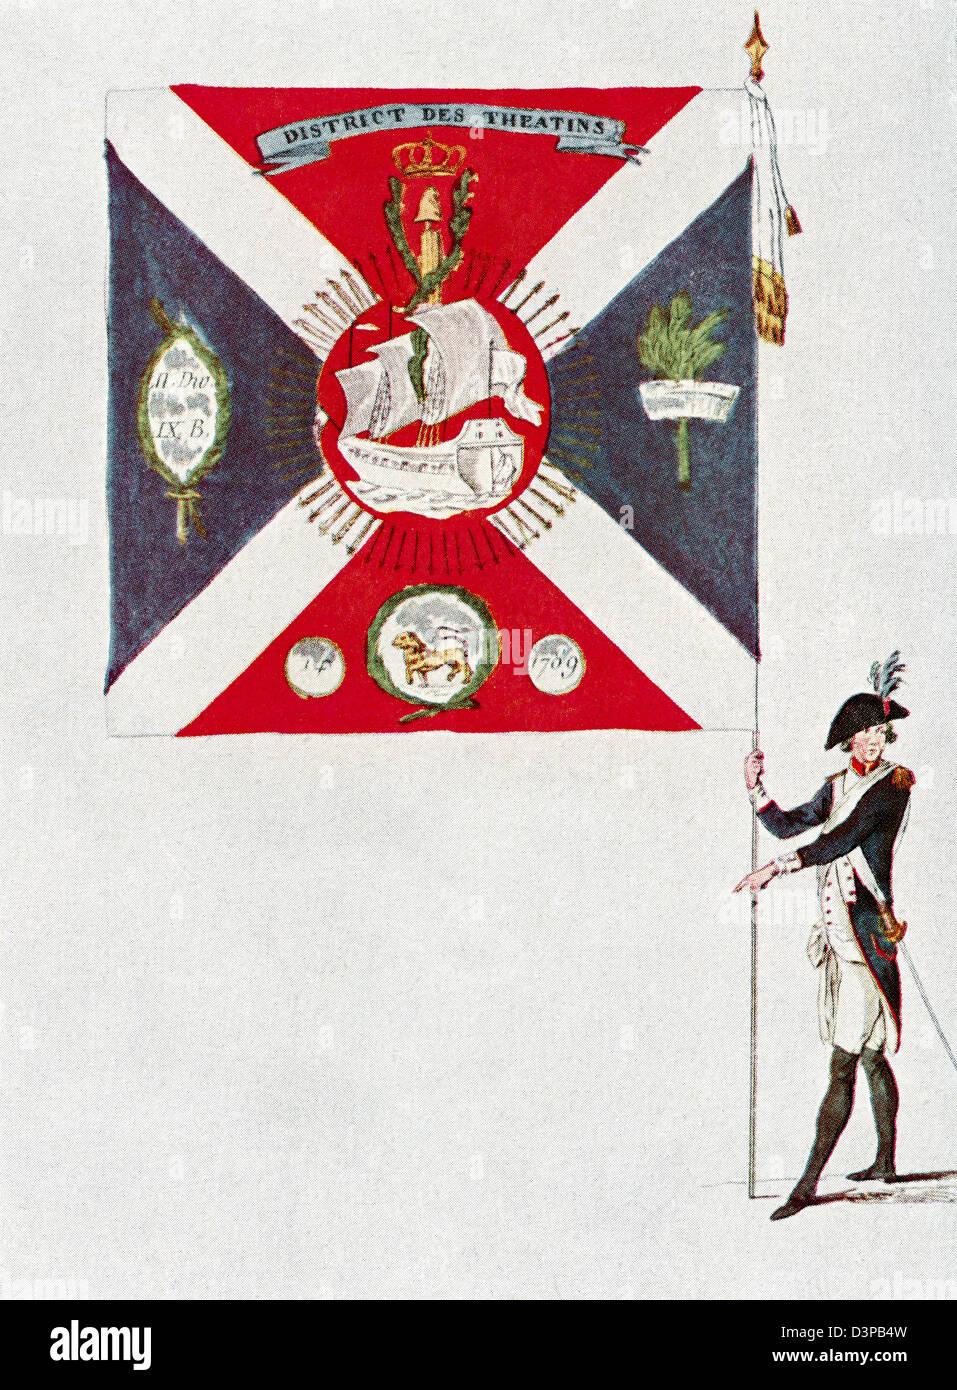 Battalion flag of the Parisien National Guard, Battalion Des Théatins. - Stock Image